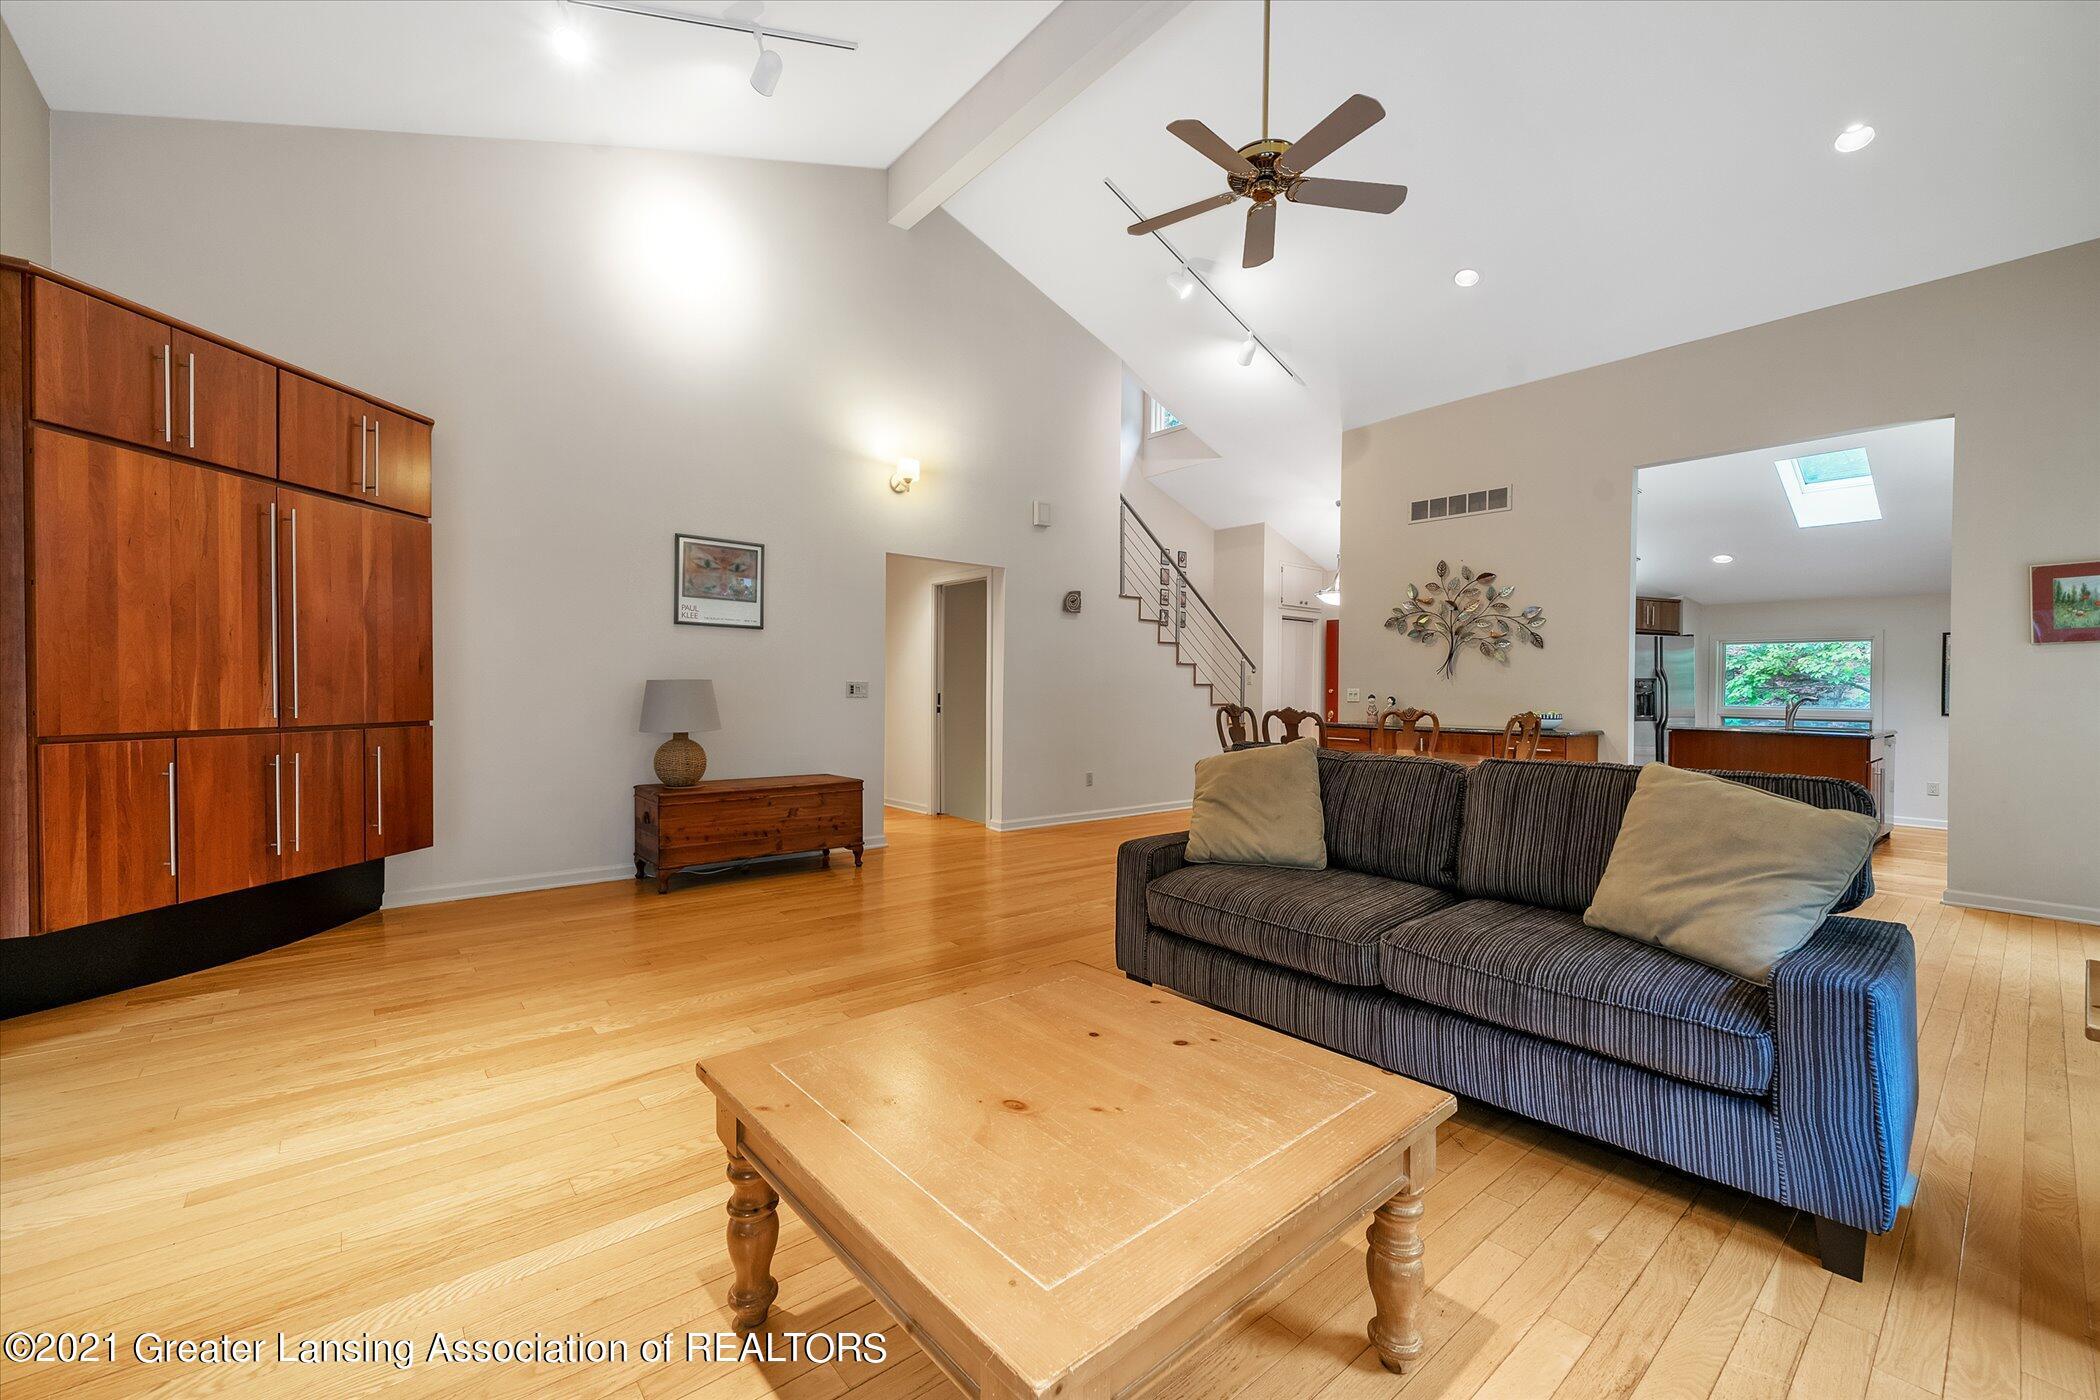 442 Shoesmith Rd - (8) MAIN FLOOR Living Room - 9